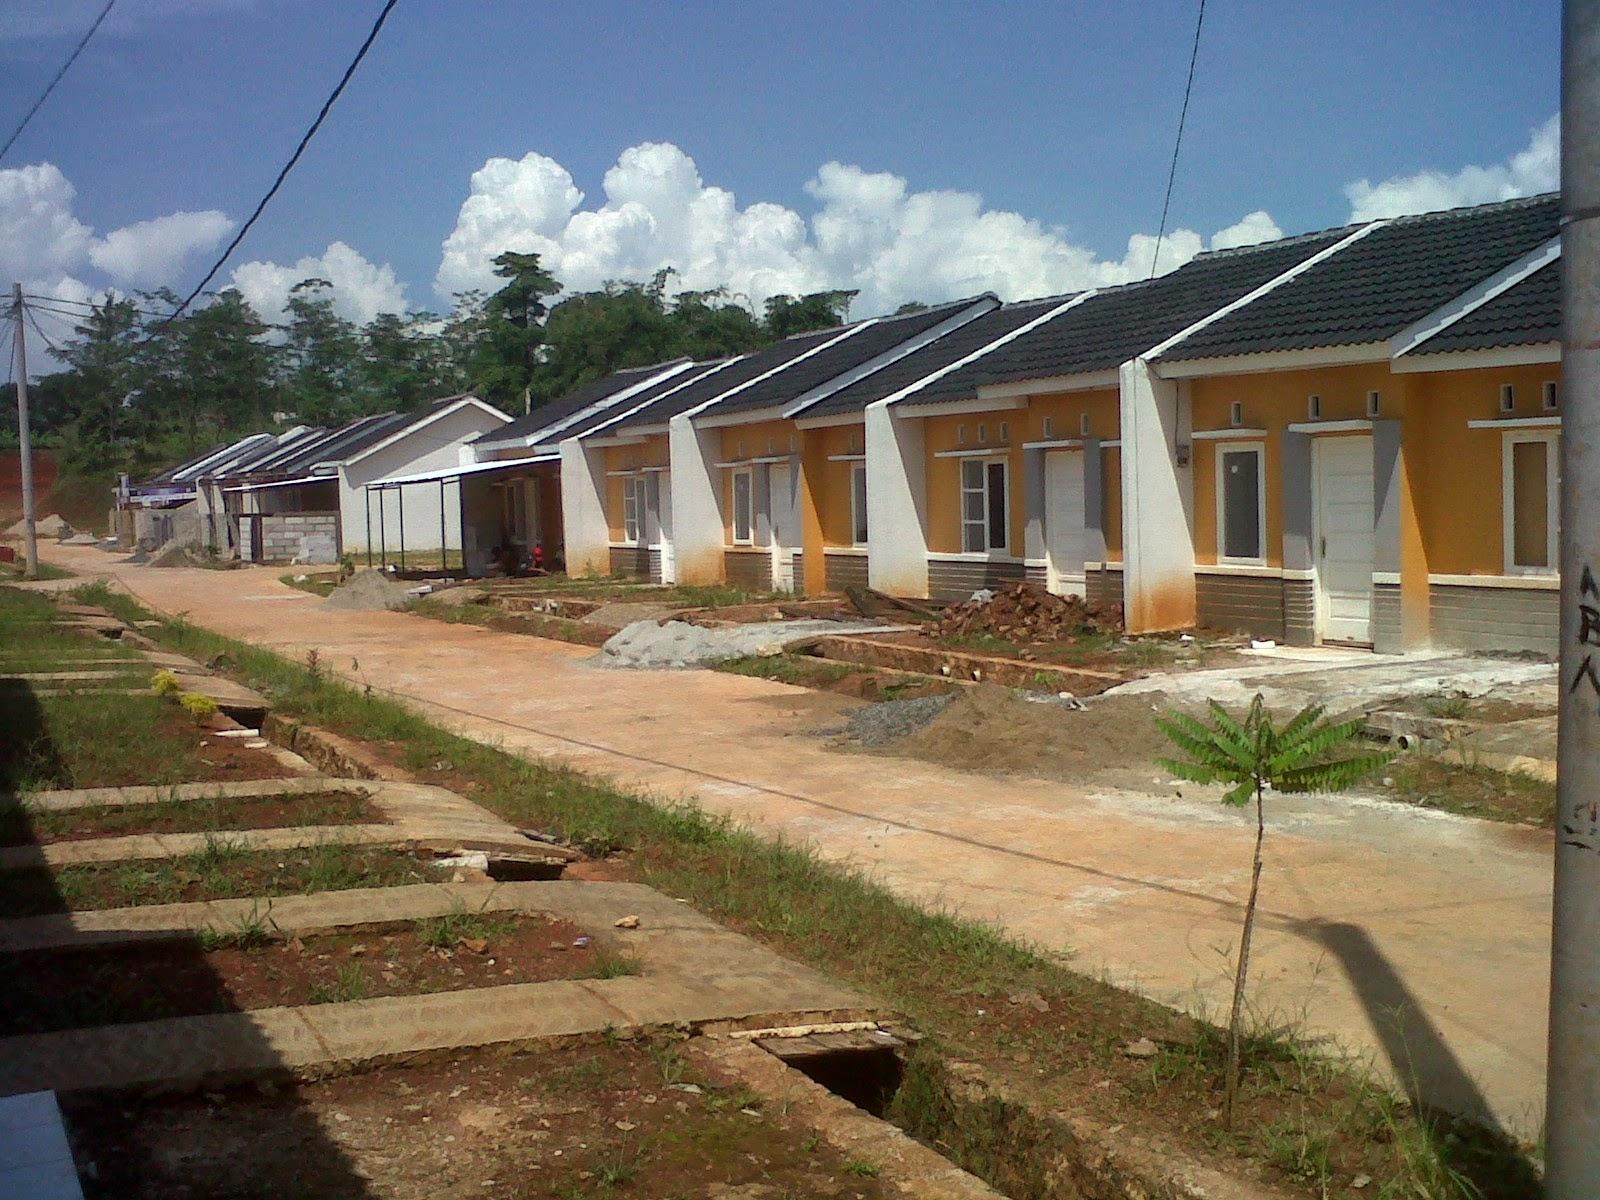 Bunga Kpr Bank Btn 2013 Dapatkan Kpr Kredit Pemilikan Rumah Terbaik Disini Cekaja Perumahan Subsidi Kpr Btn Perumahan De Paris Residences Parung